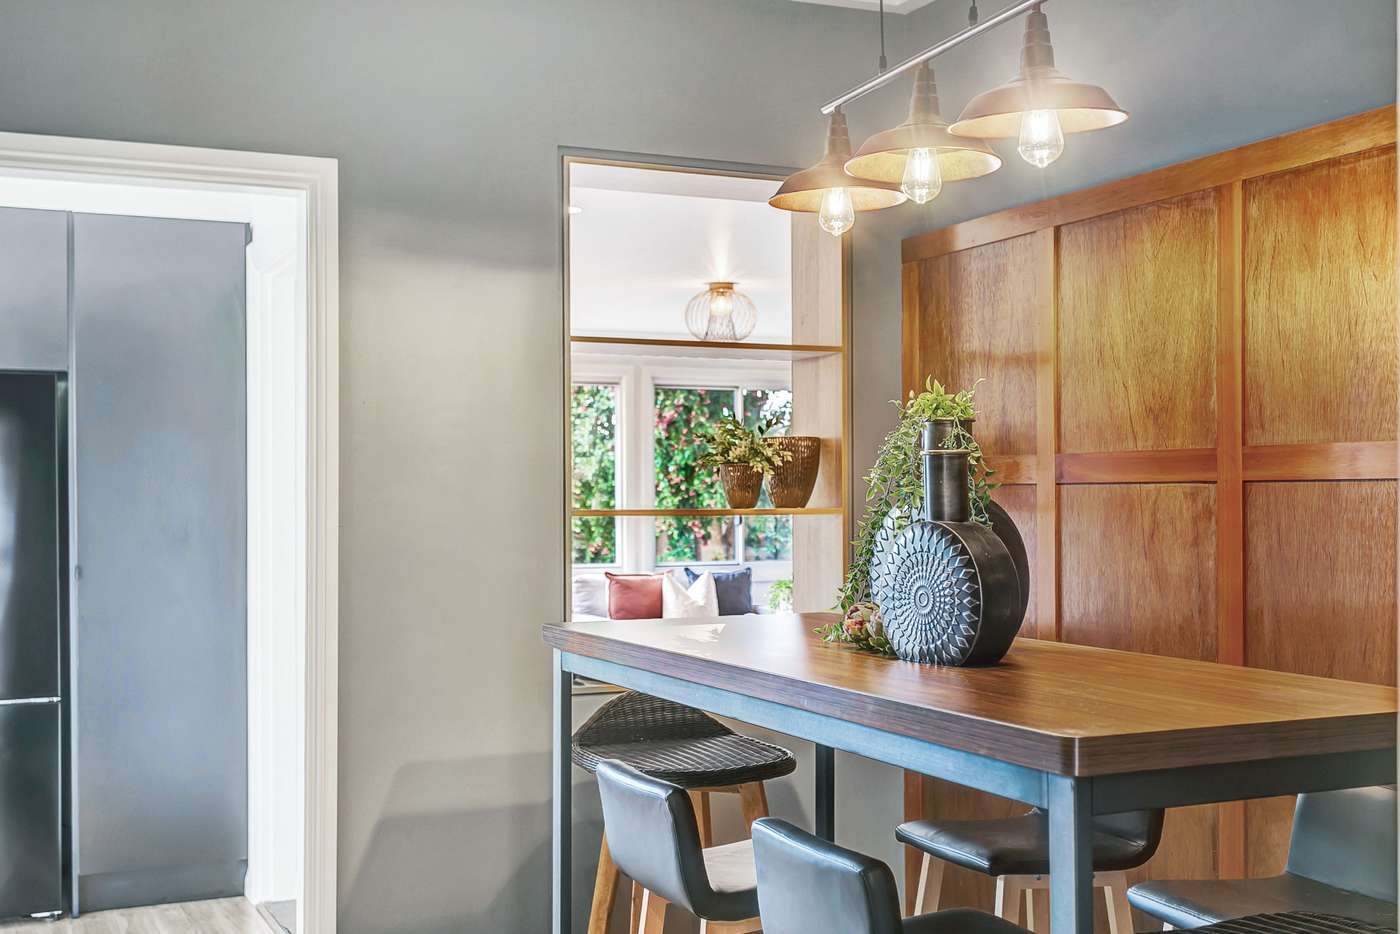 Main view of Homely house listing, 176 Raglan Avenue, South Plympton SA 5038